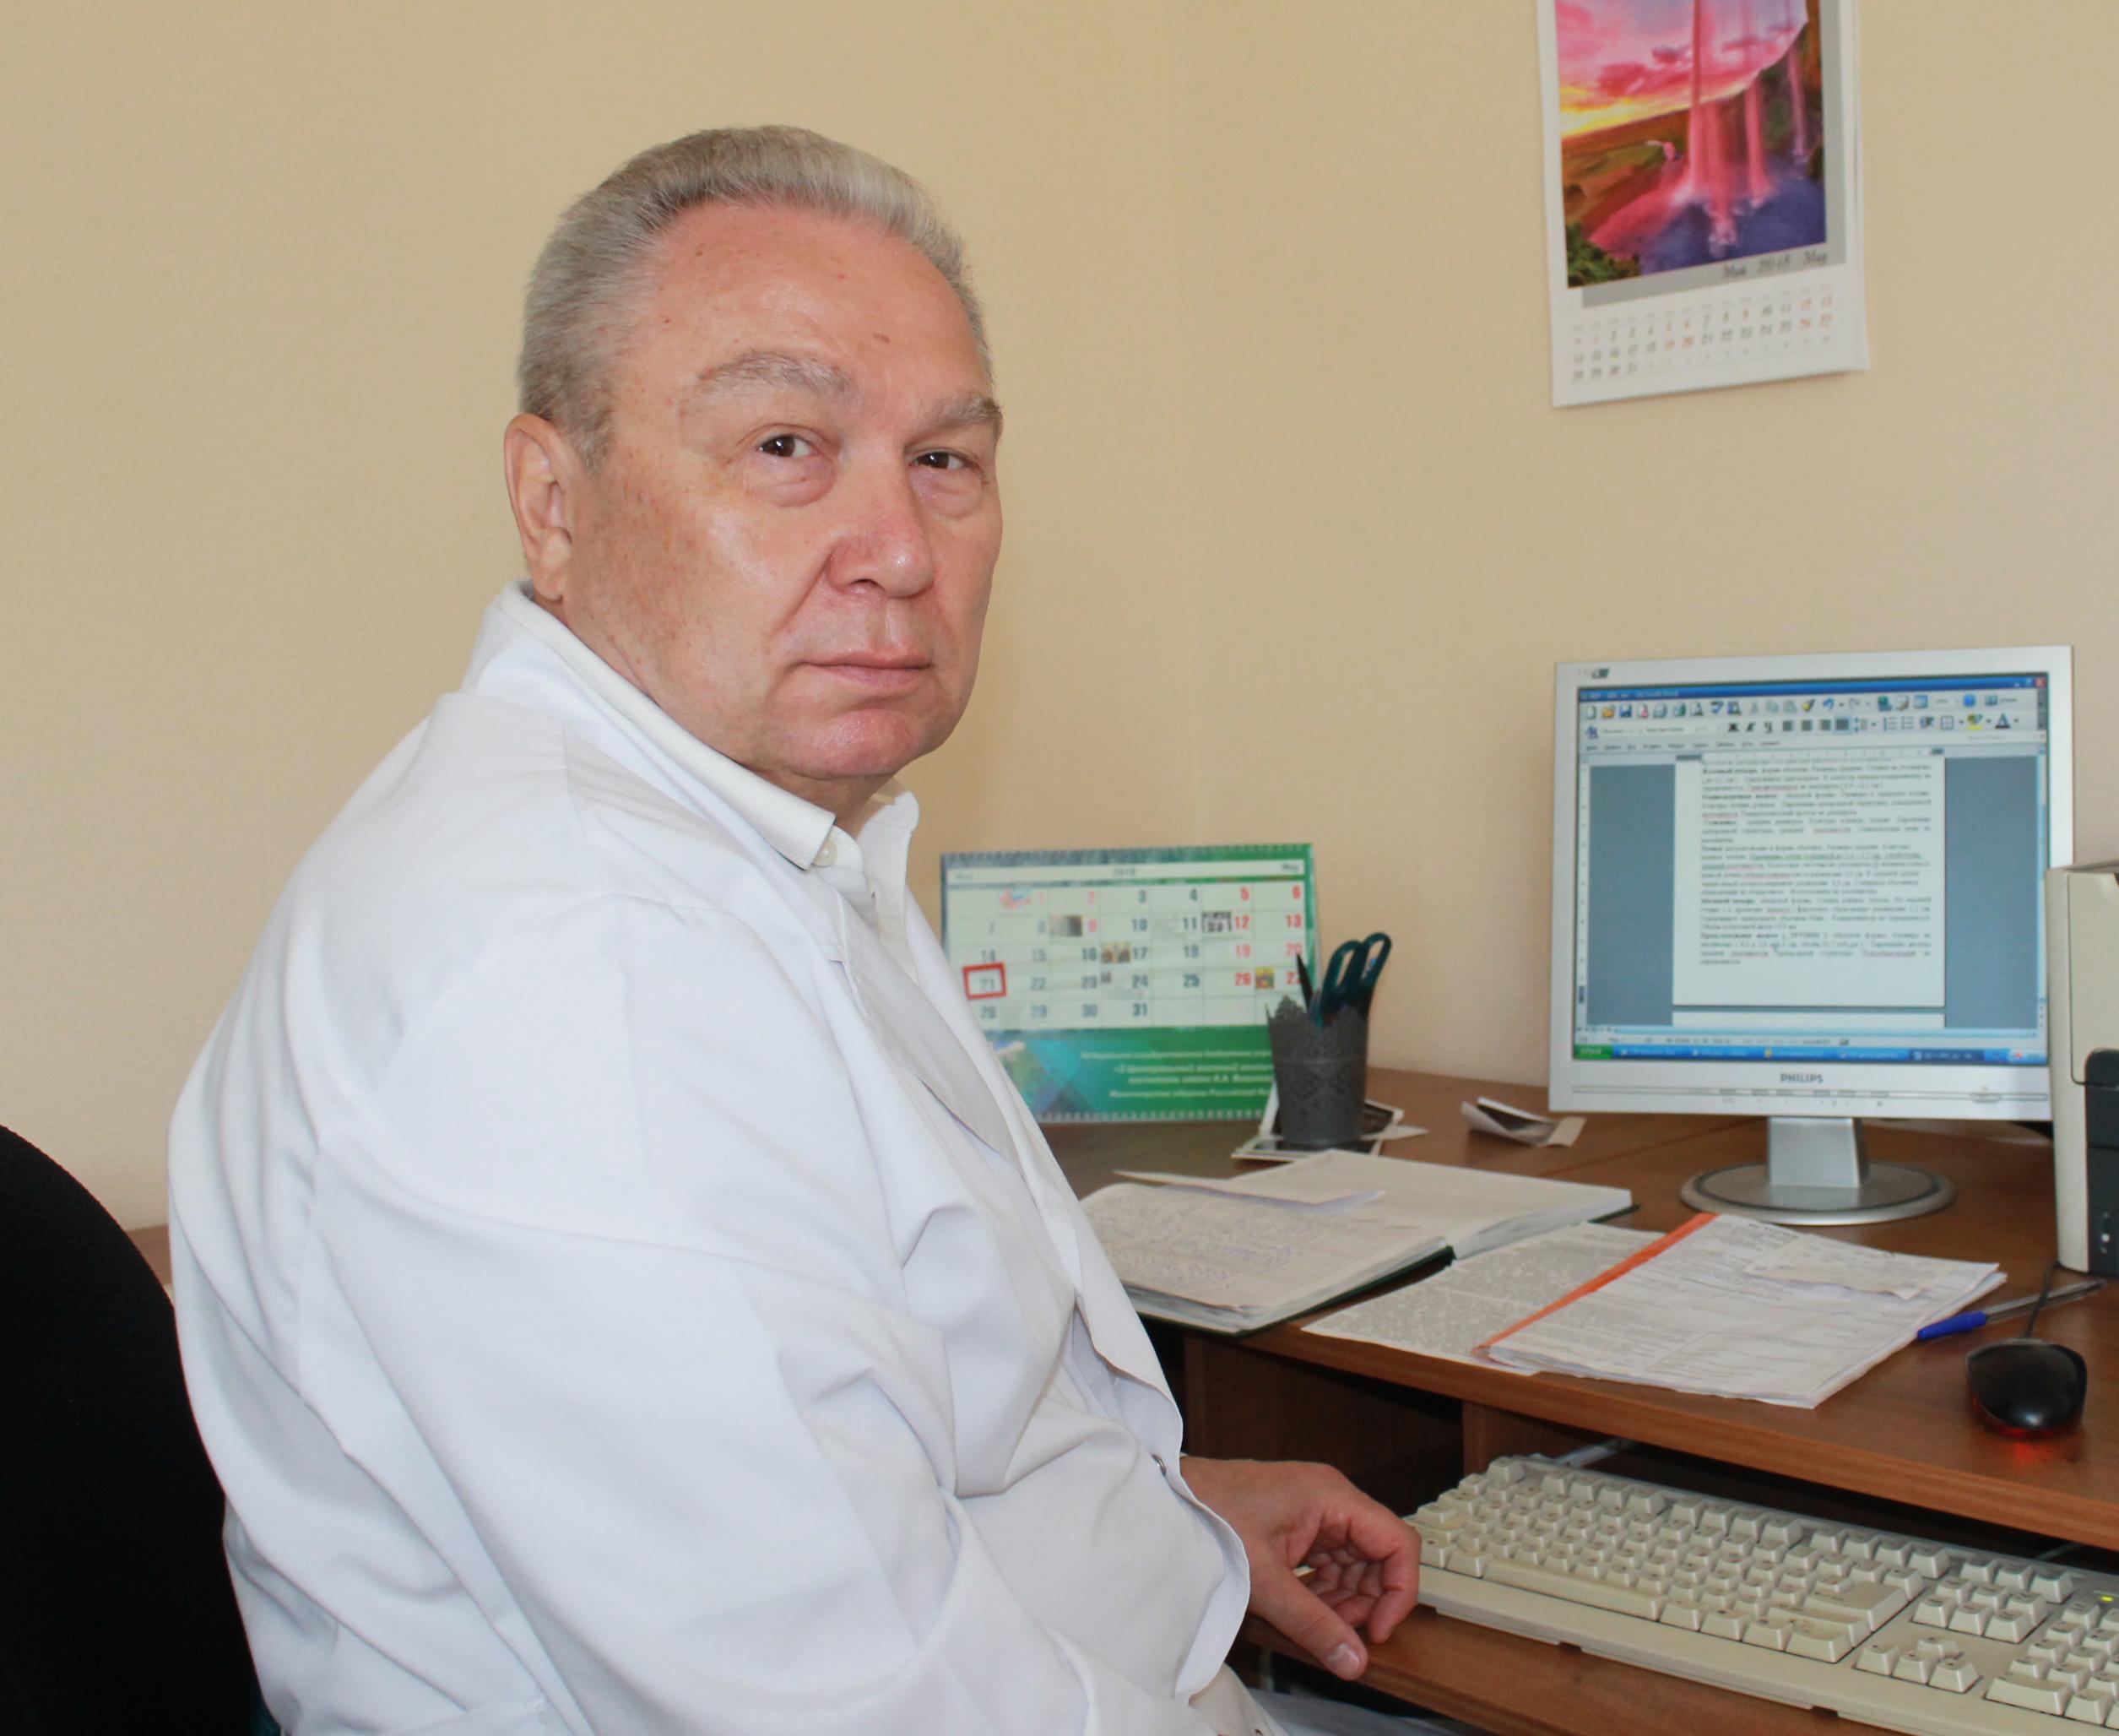 Гавриленко Владимир Михайлович Image